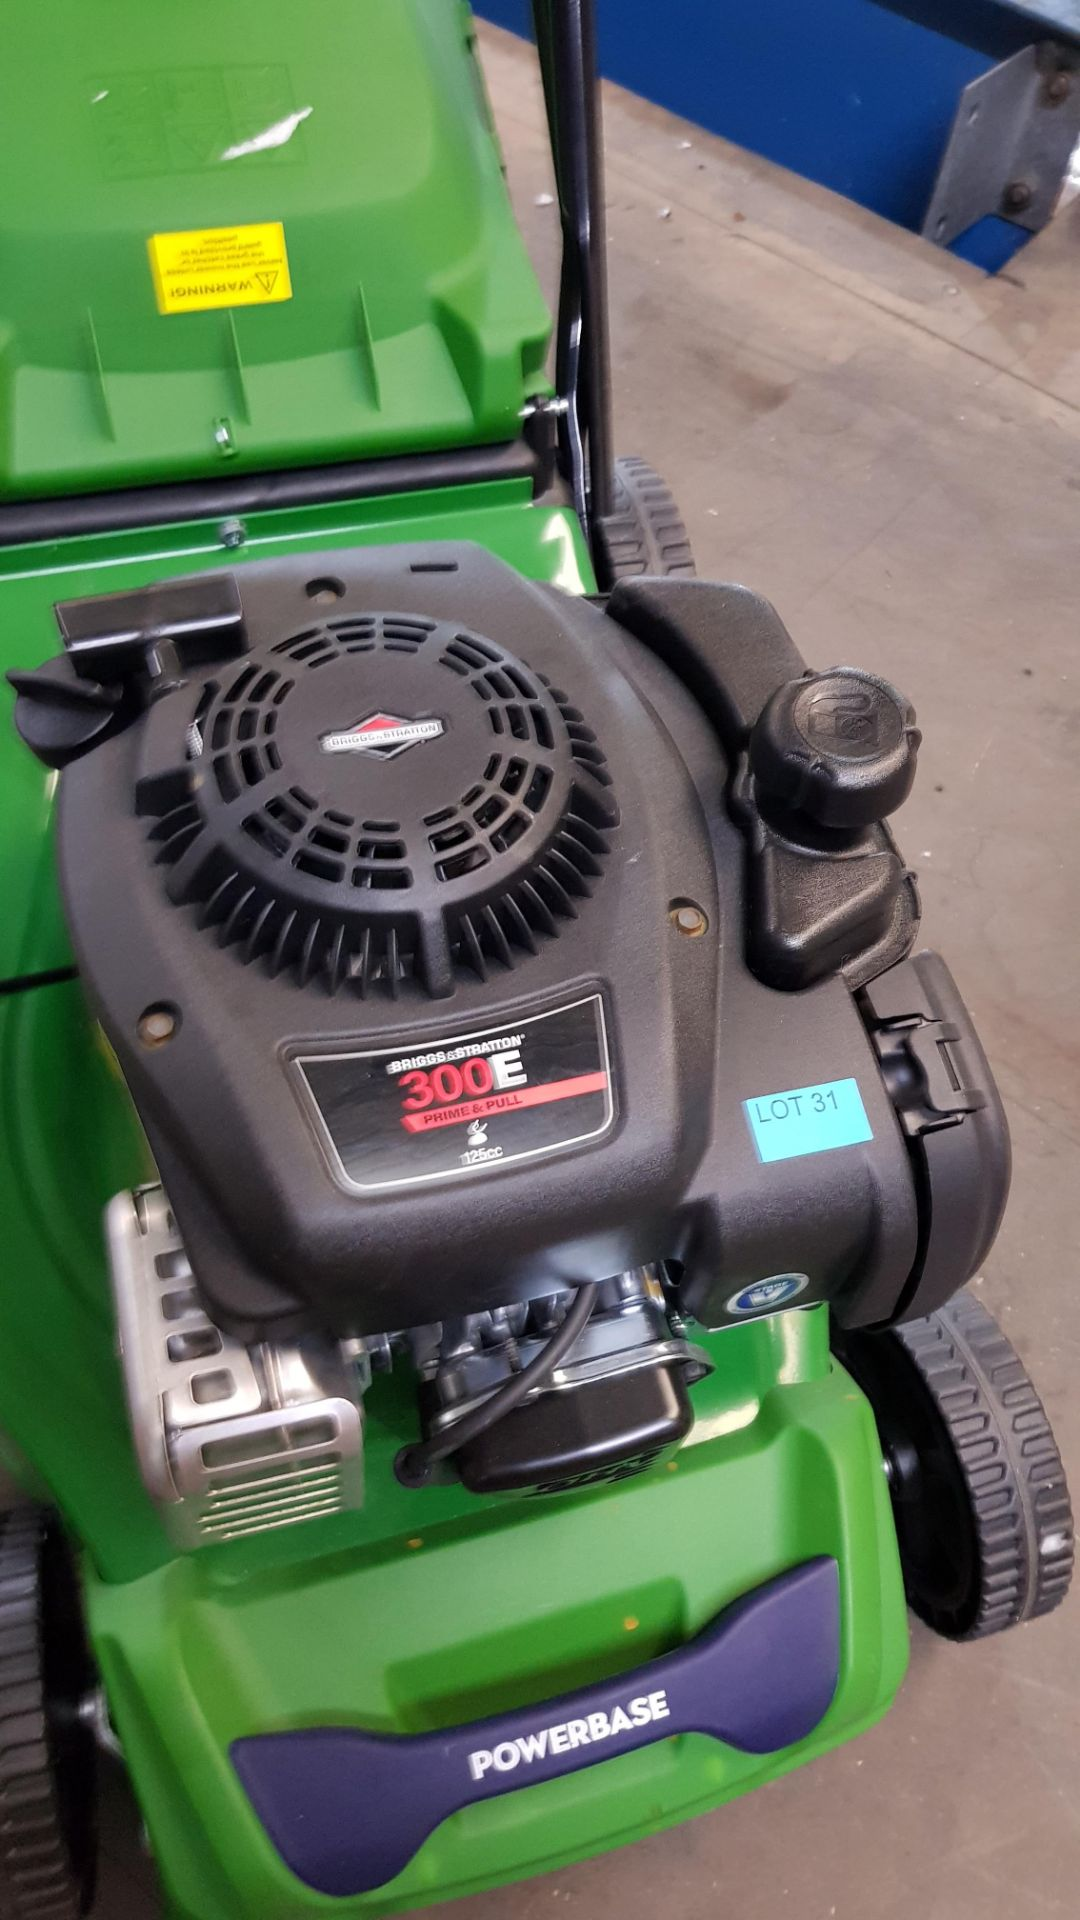 (P10) 1x Powerbase 41cm 125cc Push Petrol Rotary Lawn Mower (XSS41D) RRP £199. New, Clean Unused I - Image 8 of 8